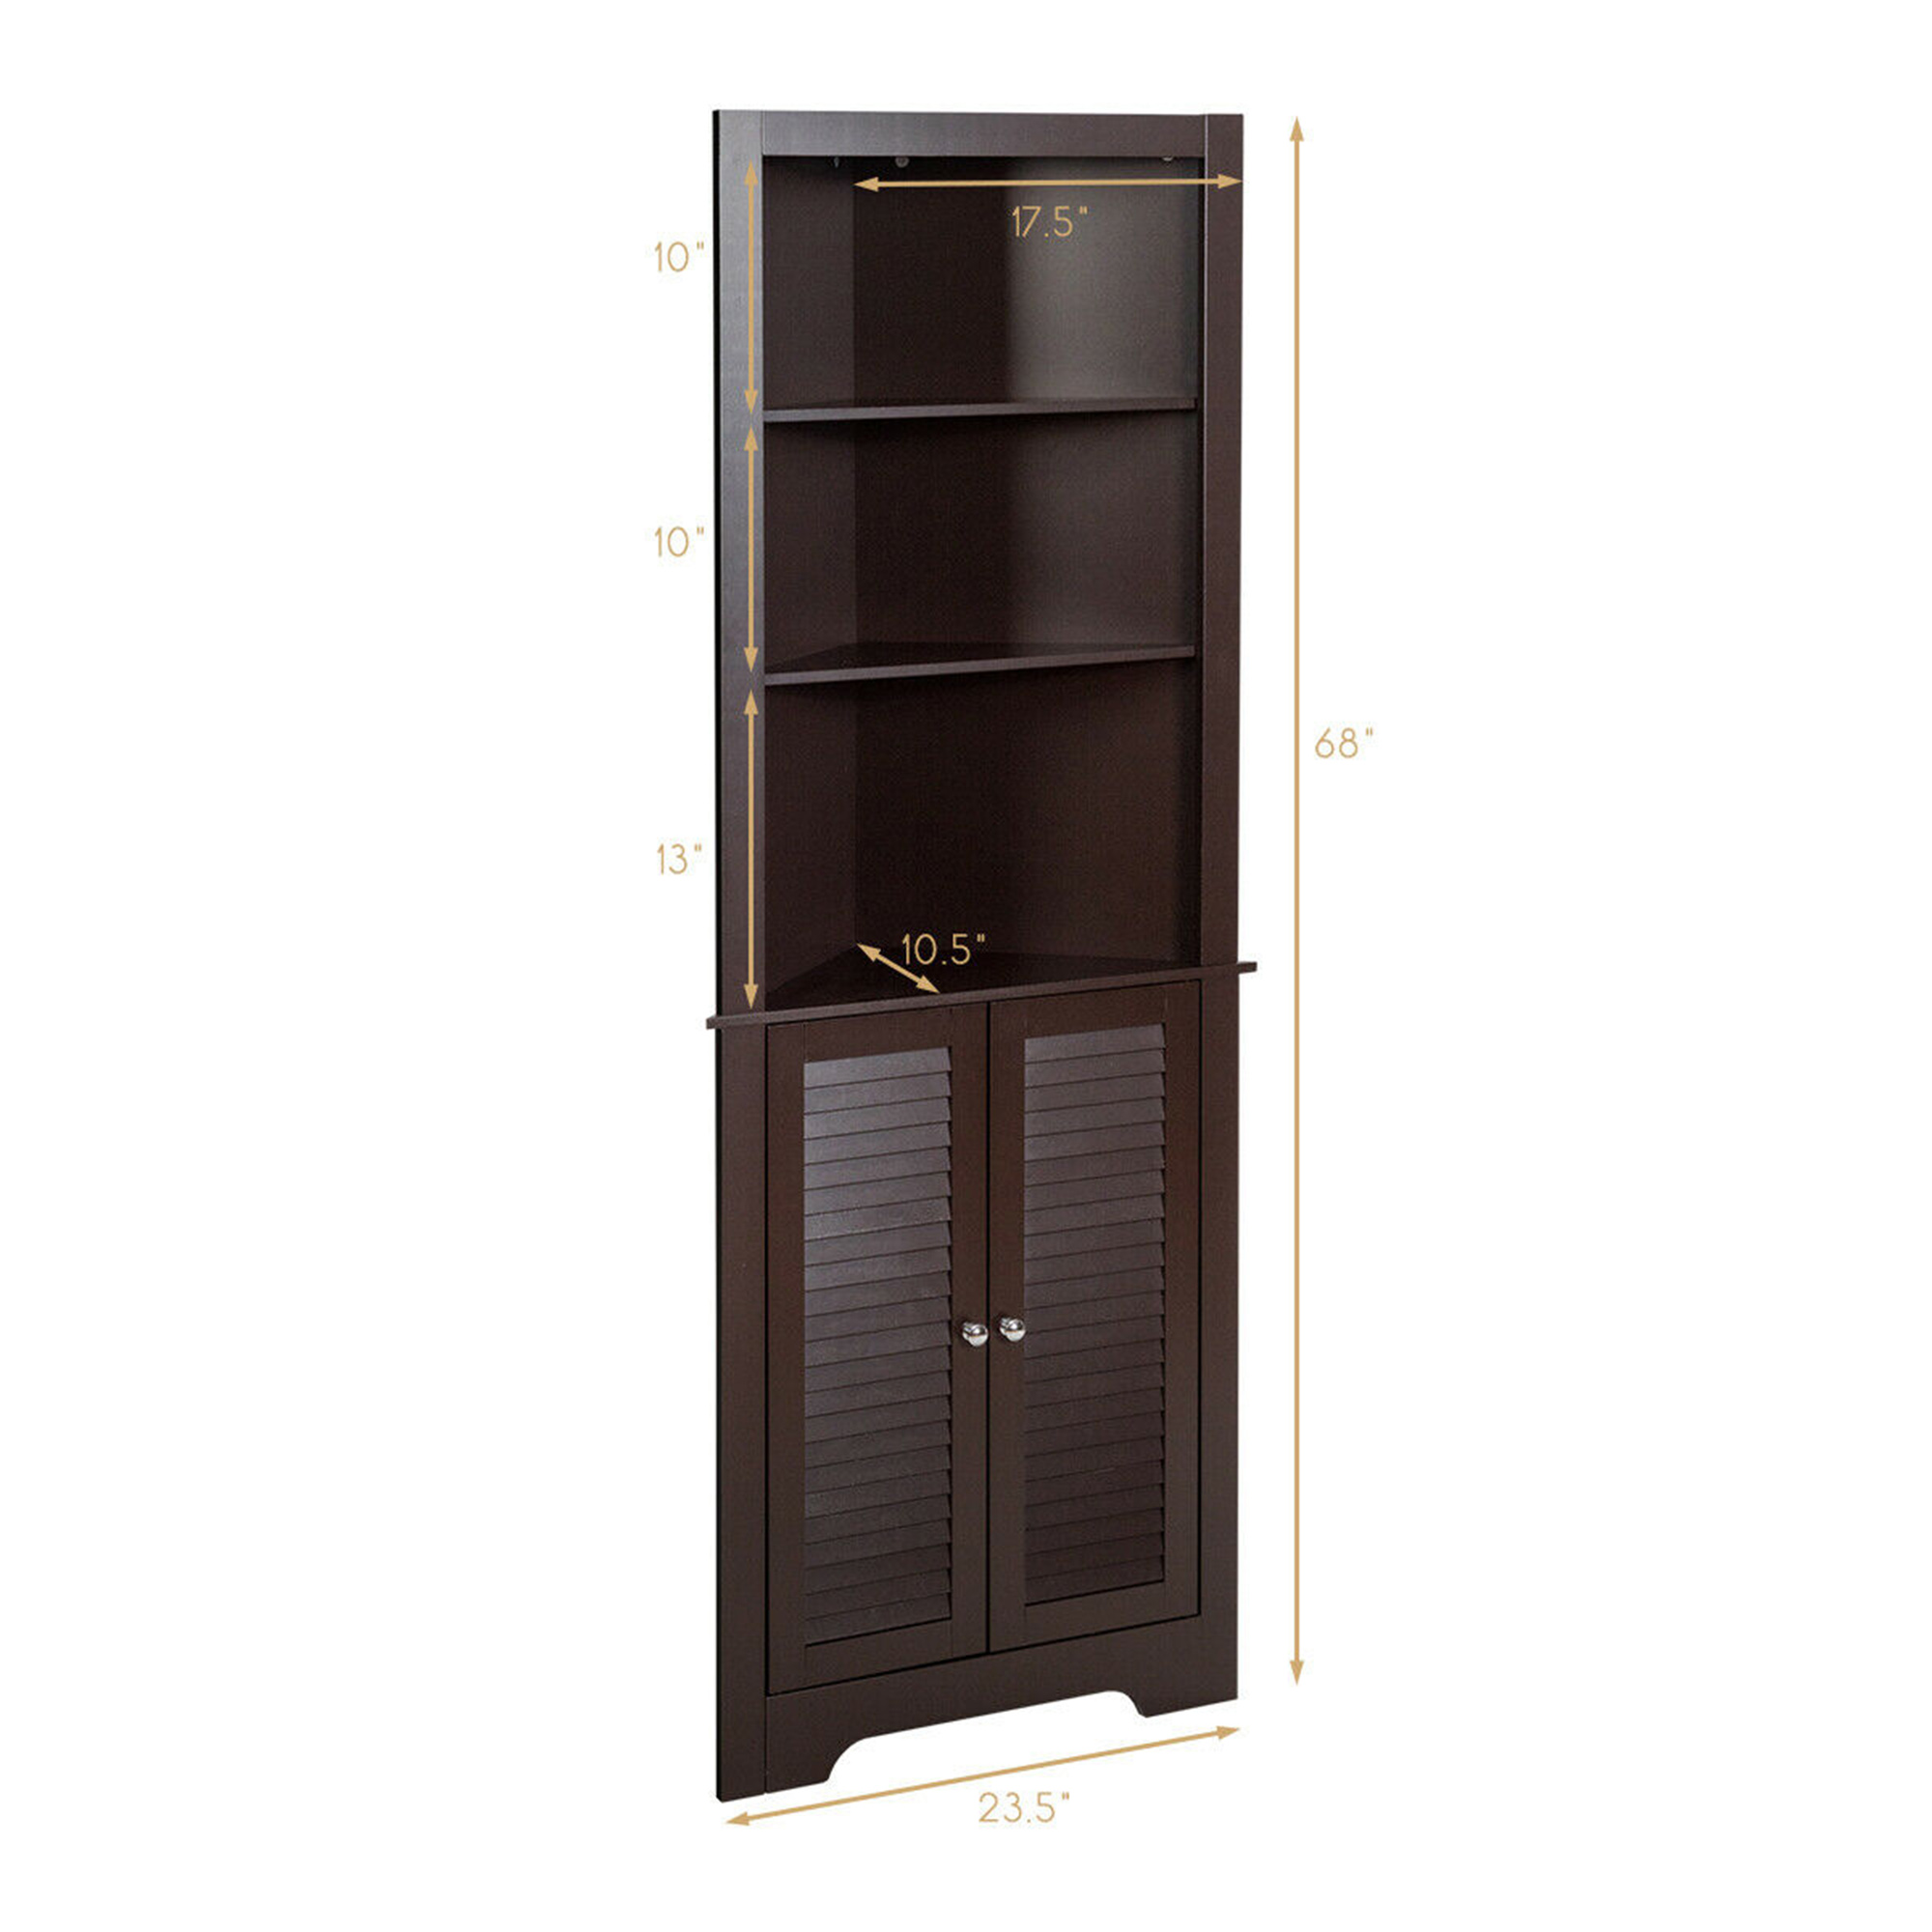 Gymax Bathroom Corner Storage Cabinet Free Standing Tall Bathroom Cabinet W 3 Shelves Walmart Com Walmart Com